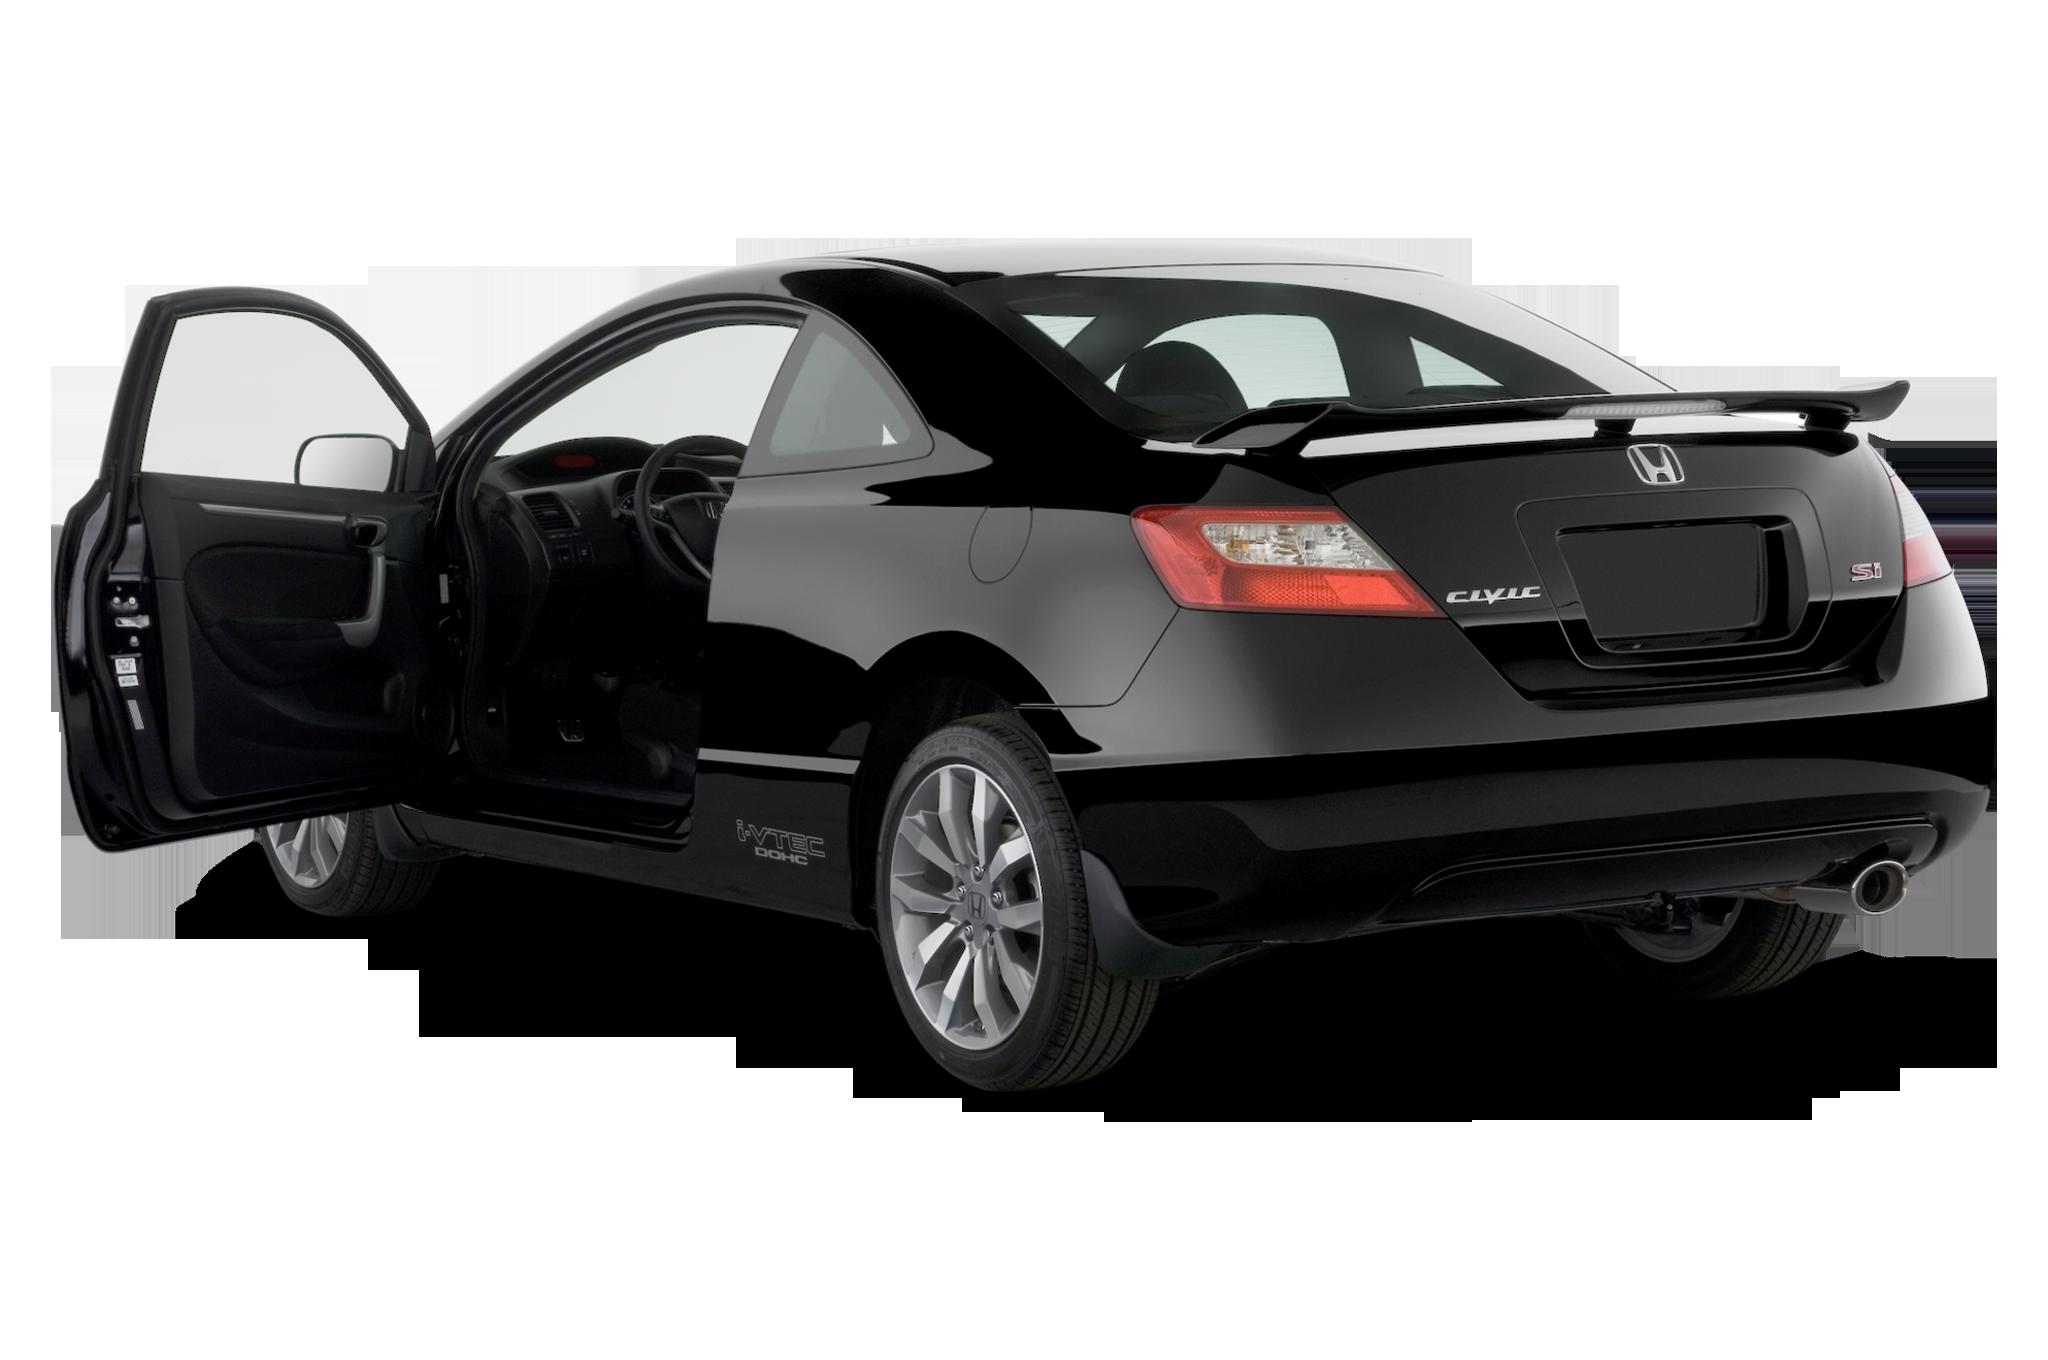 2010 Honda Civic Si Coupe Automobile Magazine